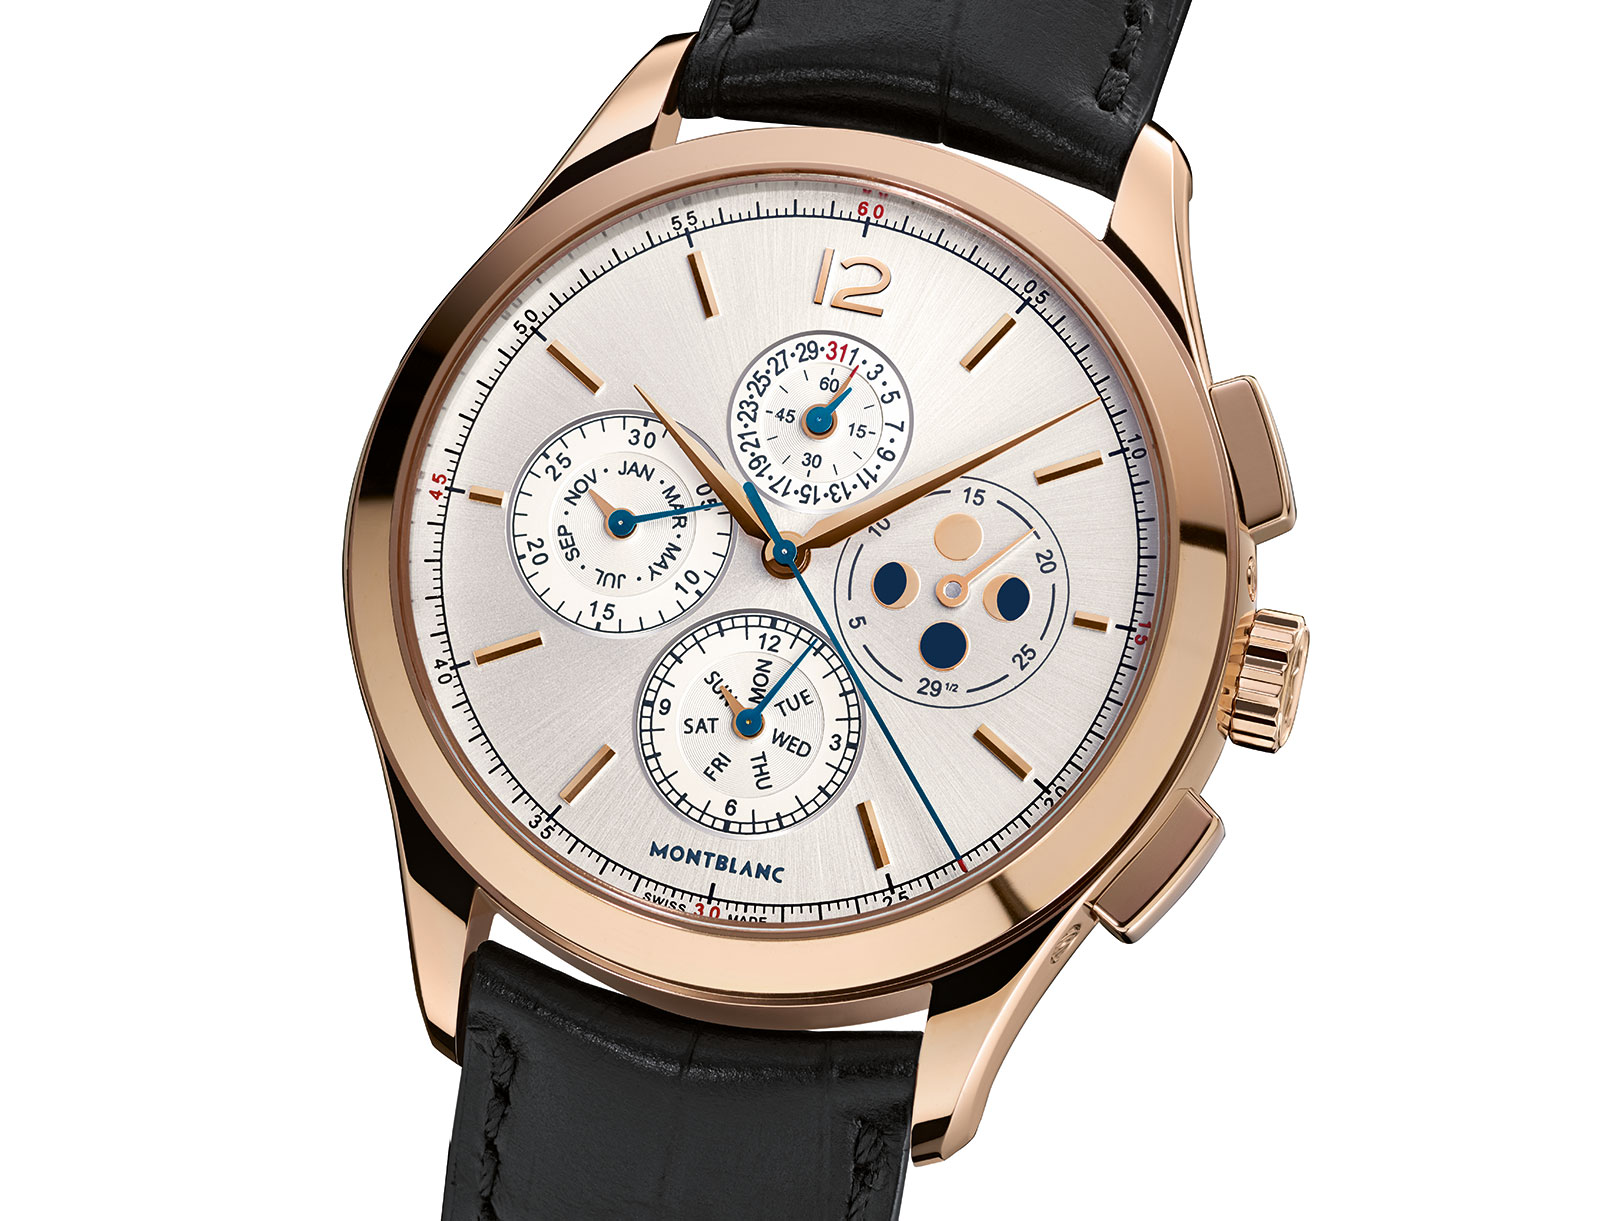 montblanc-heritage-chronometrie-chronograph-annual-calendar-2